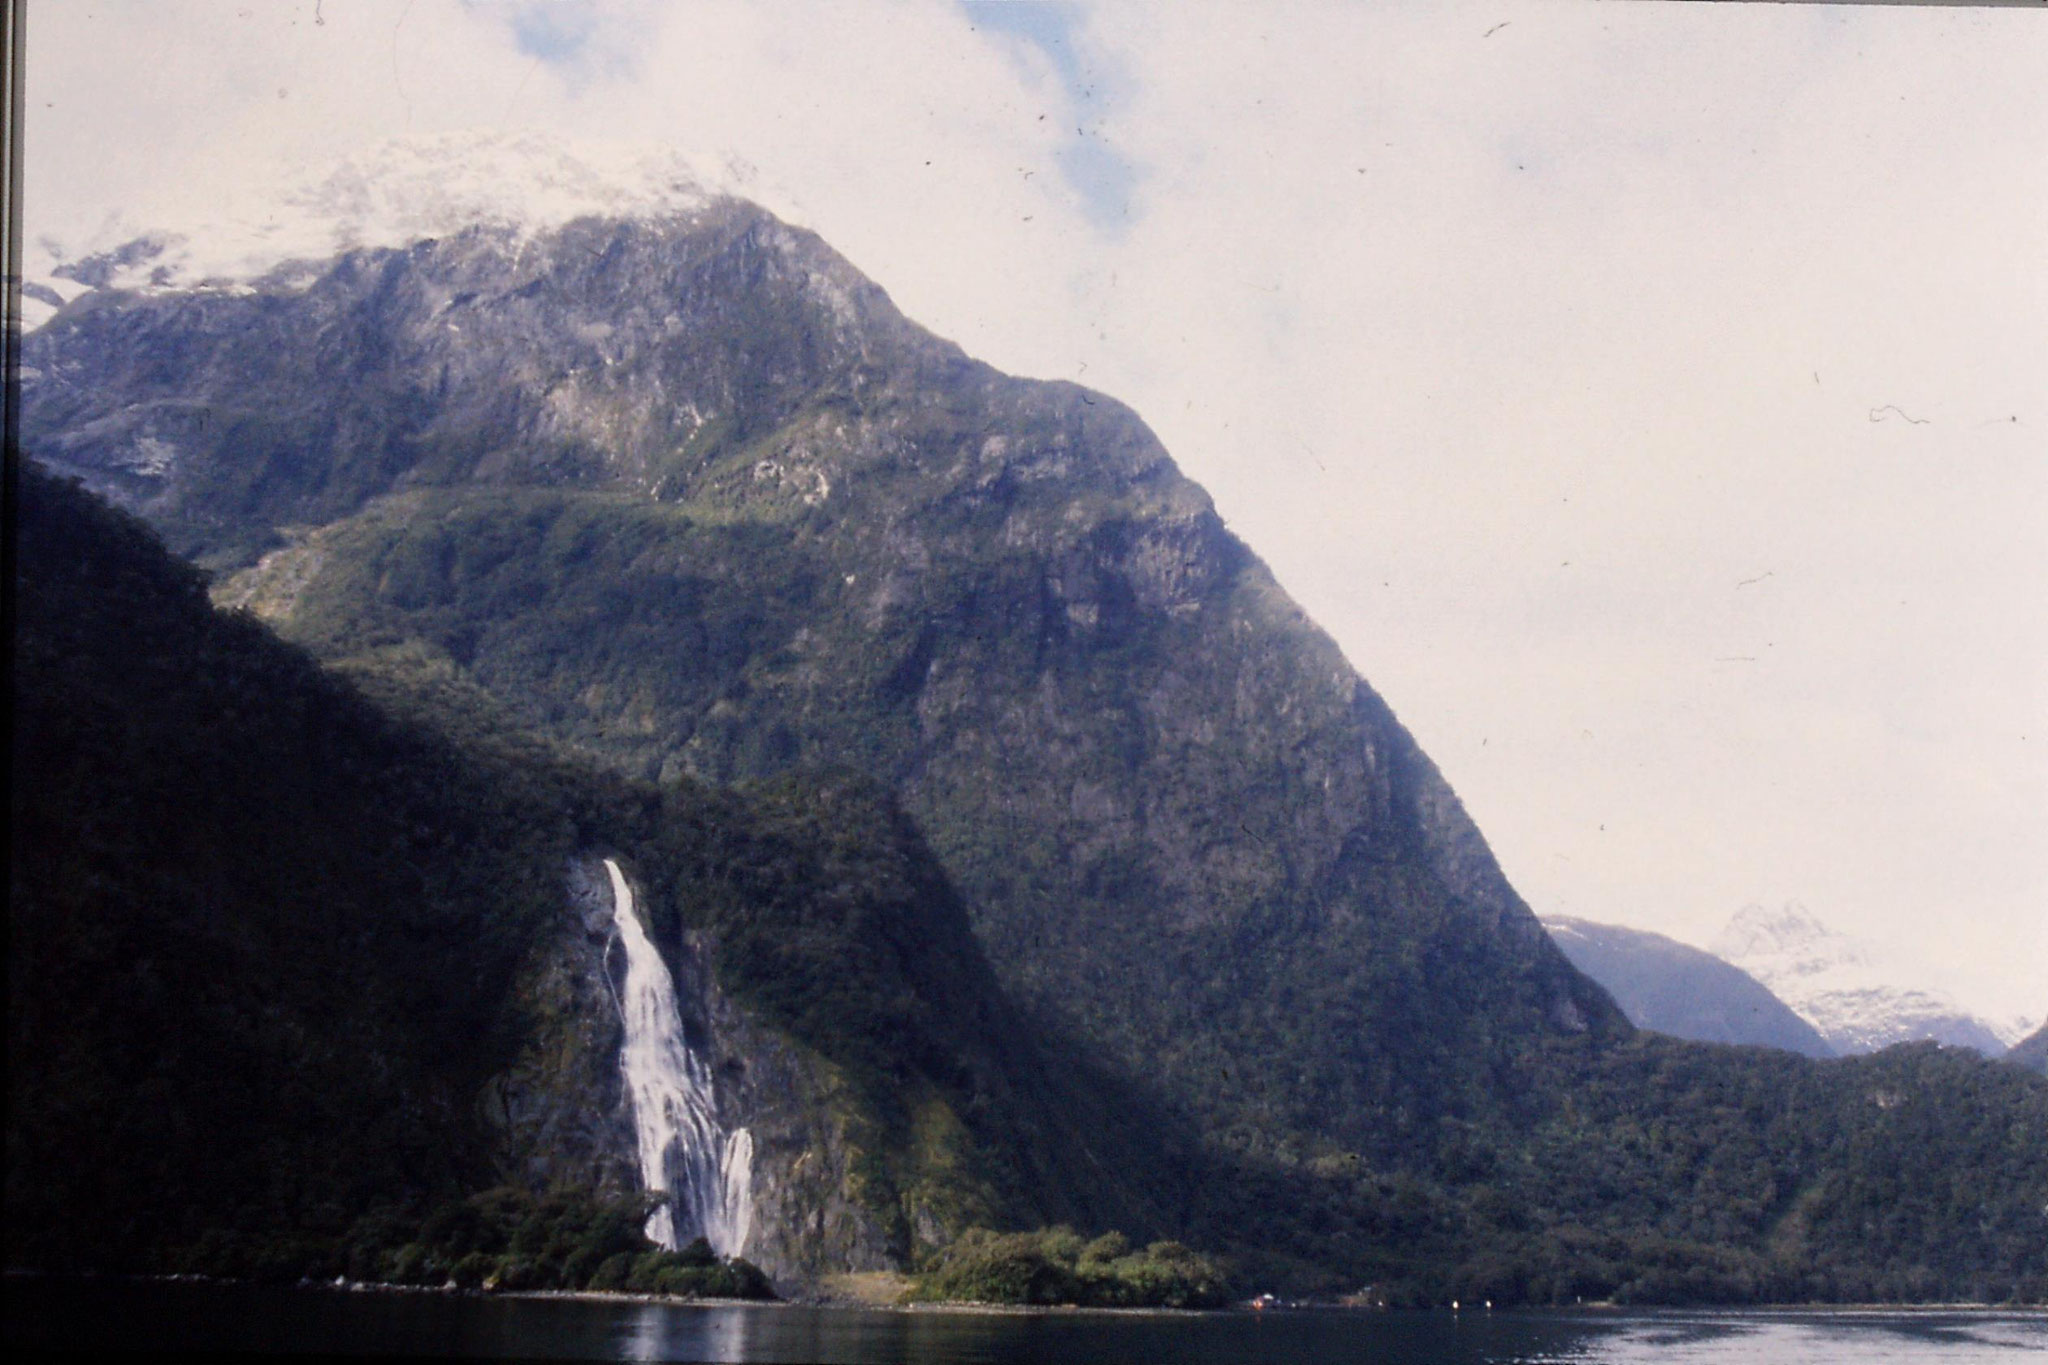 15/8/1990: 7: Lady Bowen Falls on Milford Sound